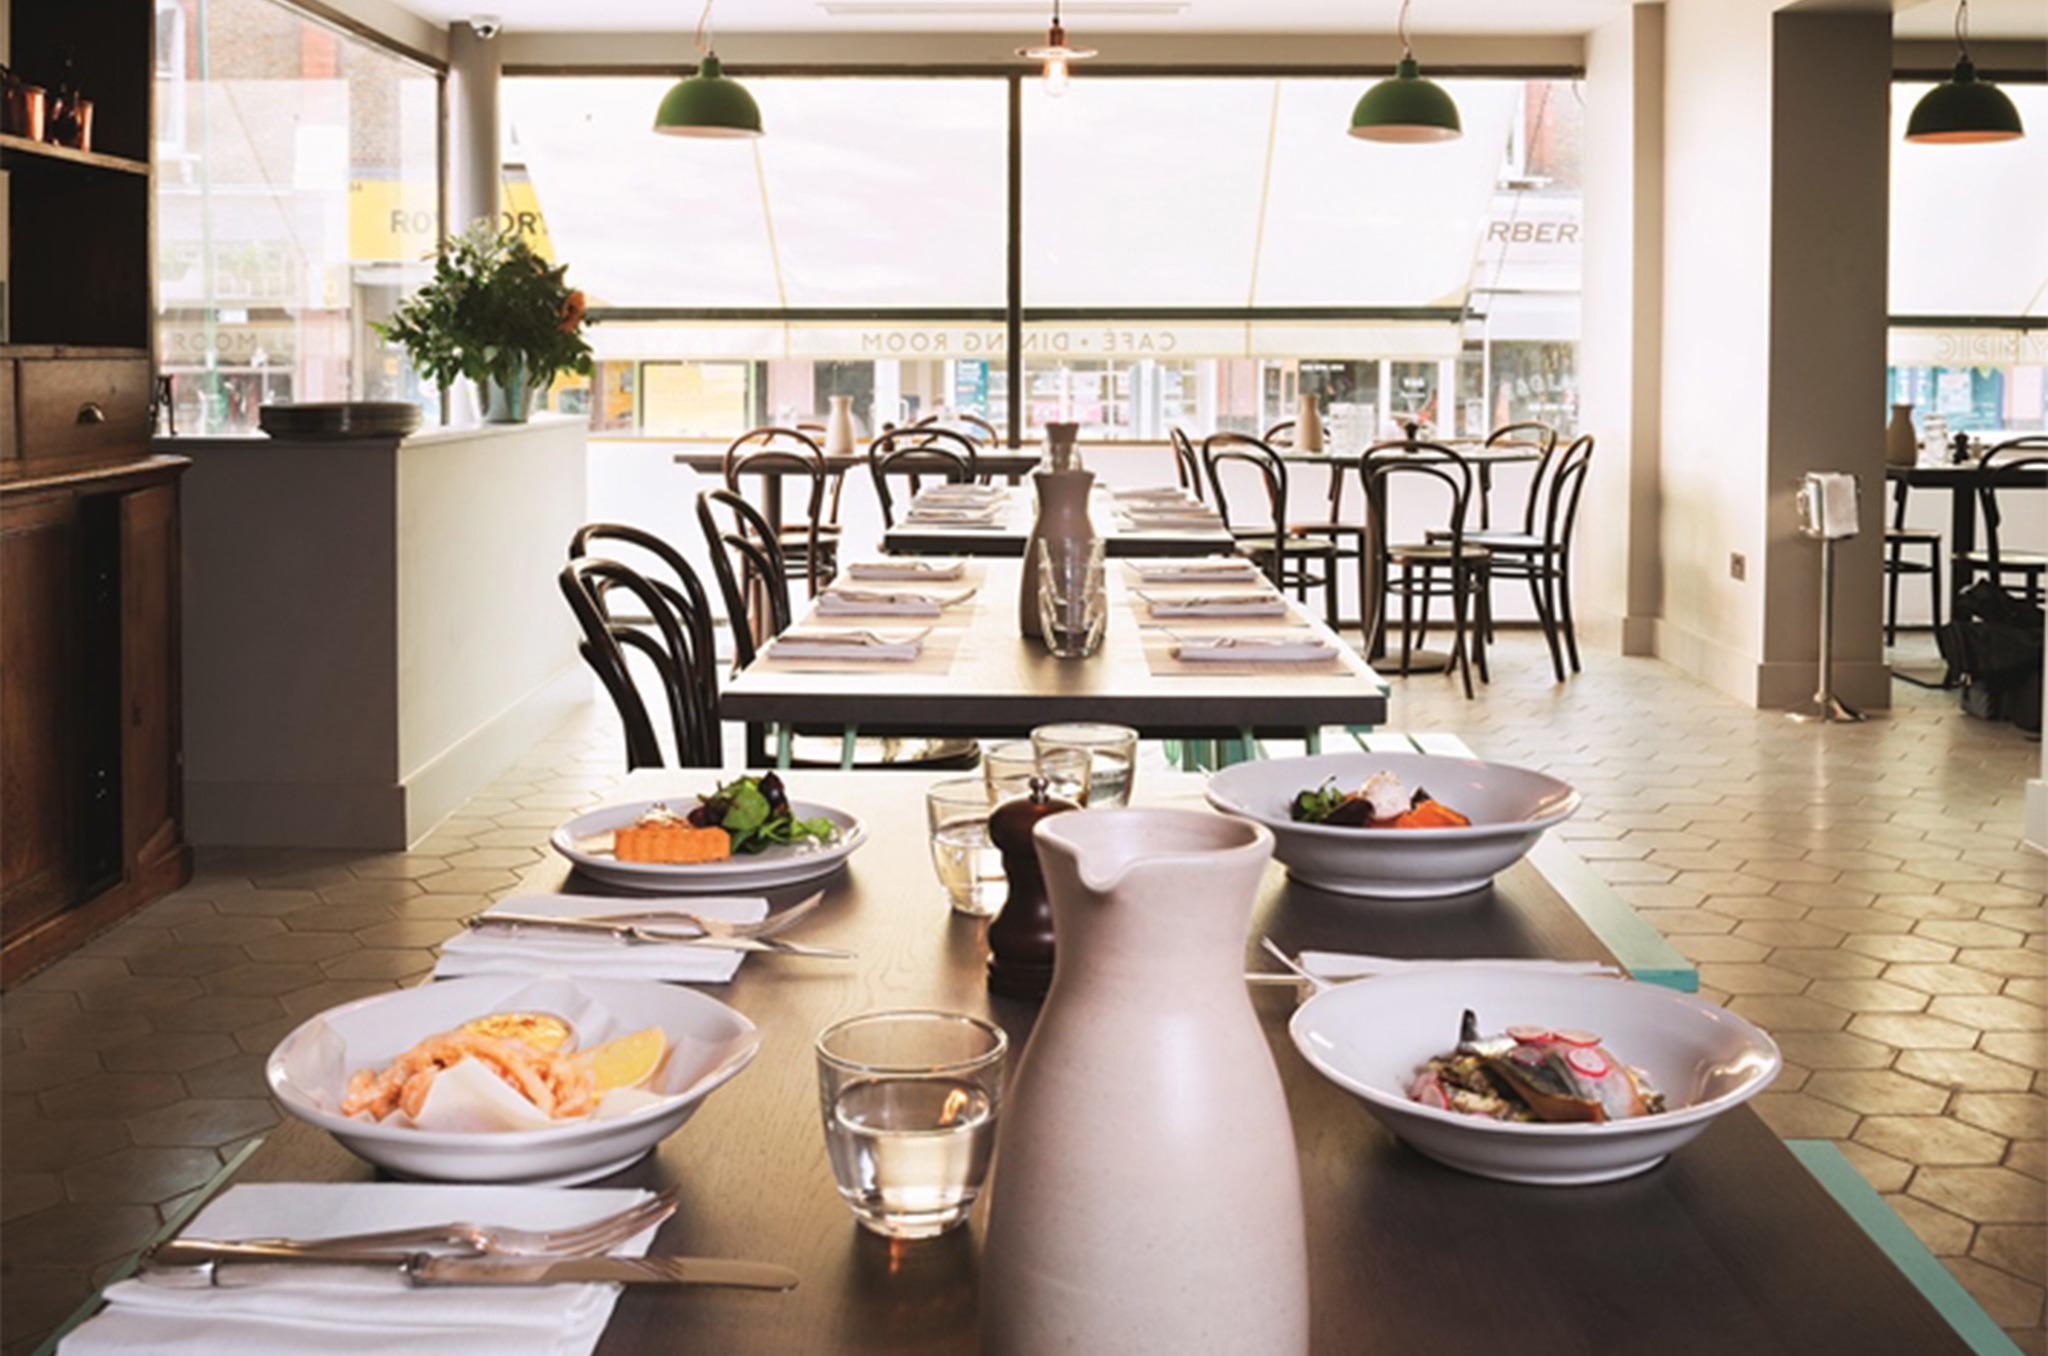 Olympic Café & Dining Room   Restaurants in Barnes, London